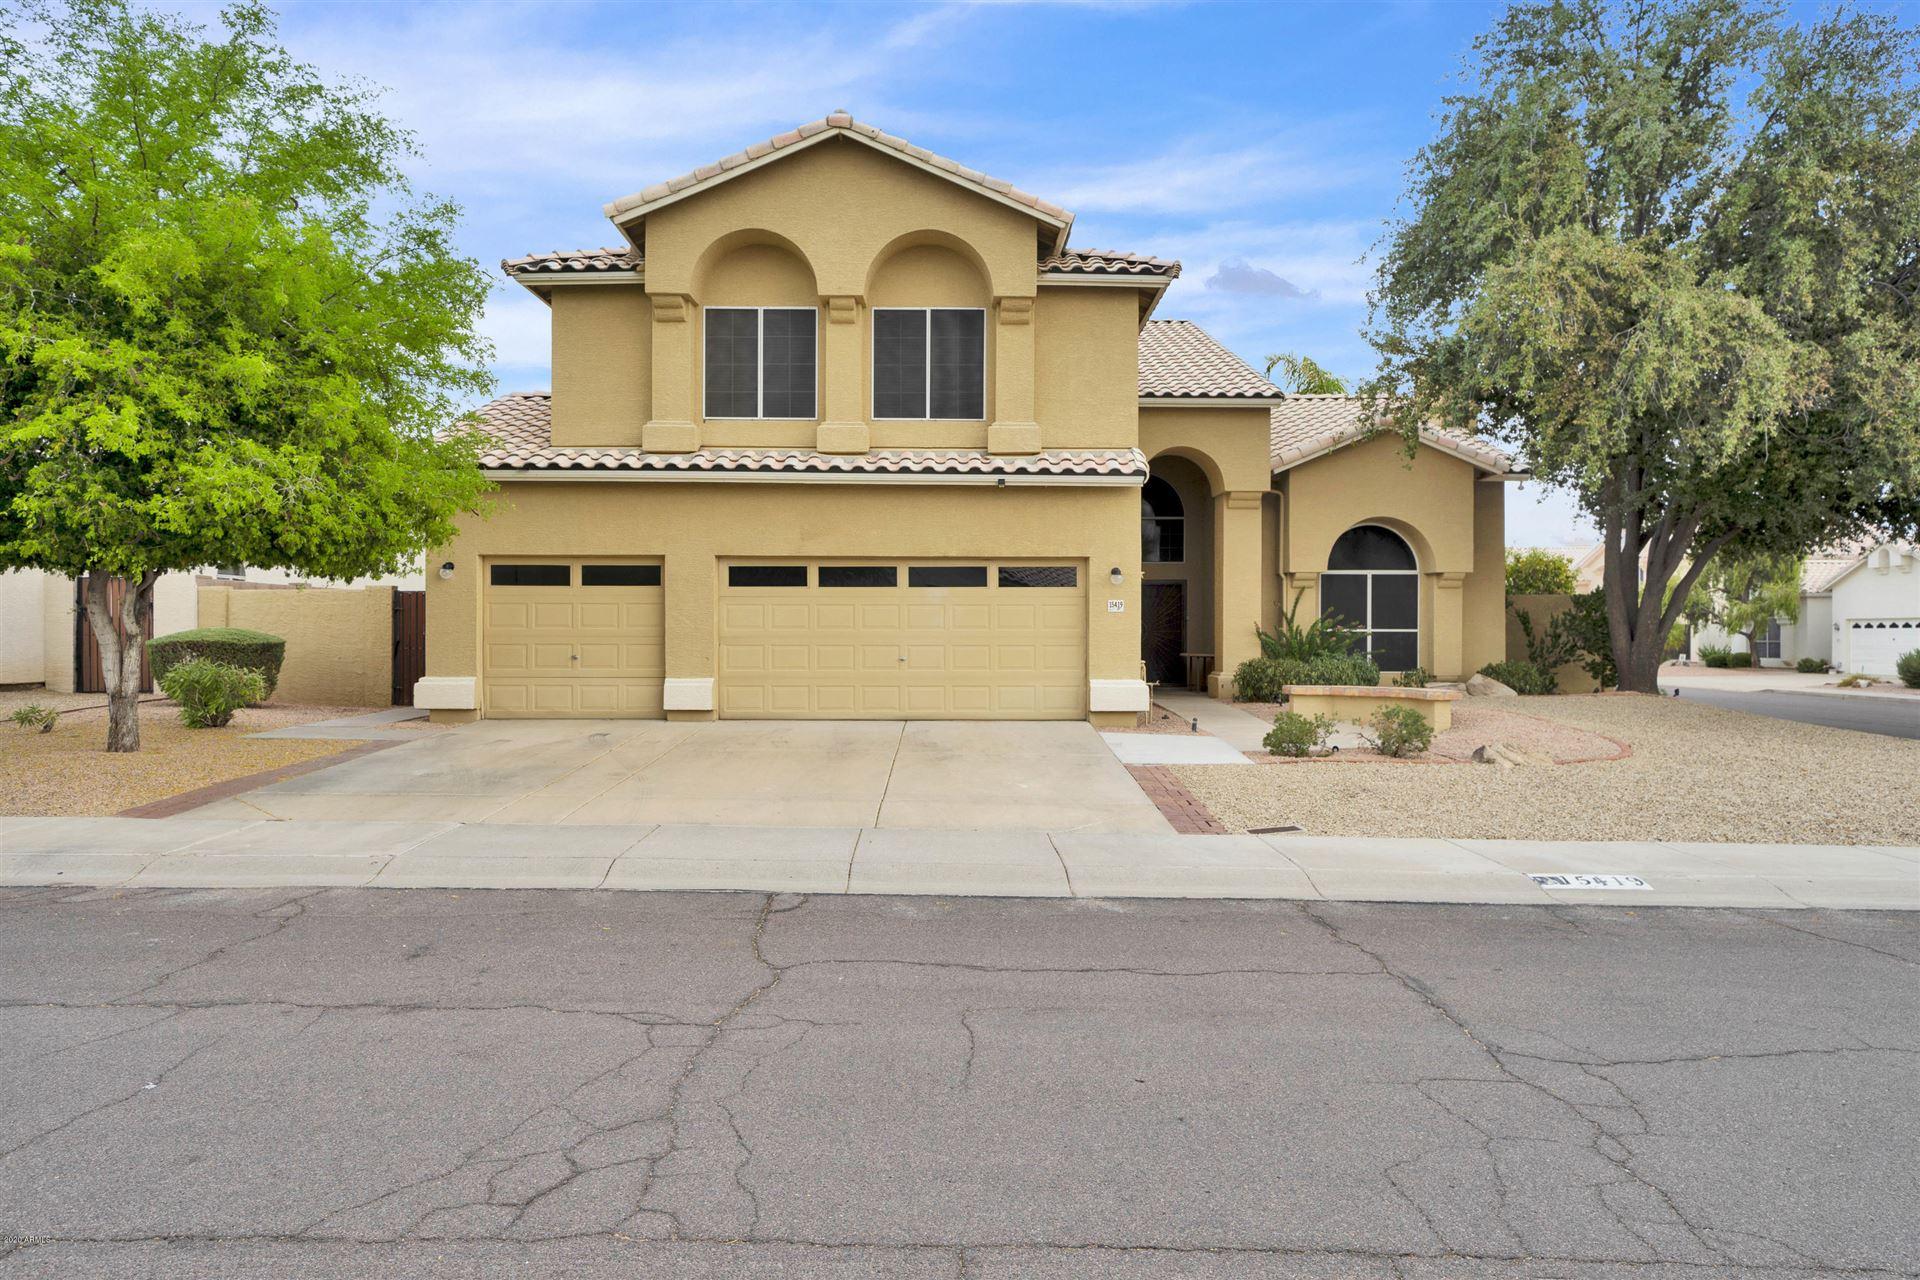 15419 N 13TH Avenue, Phoenix, AZ 85023 - MLS#: 6121437